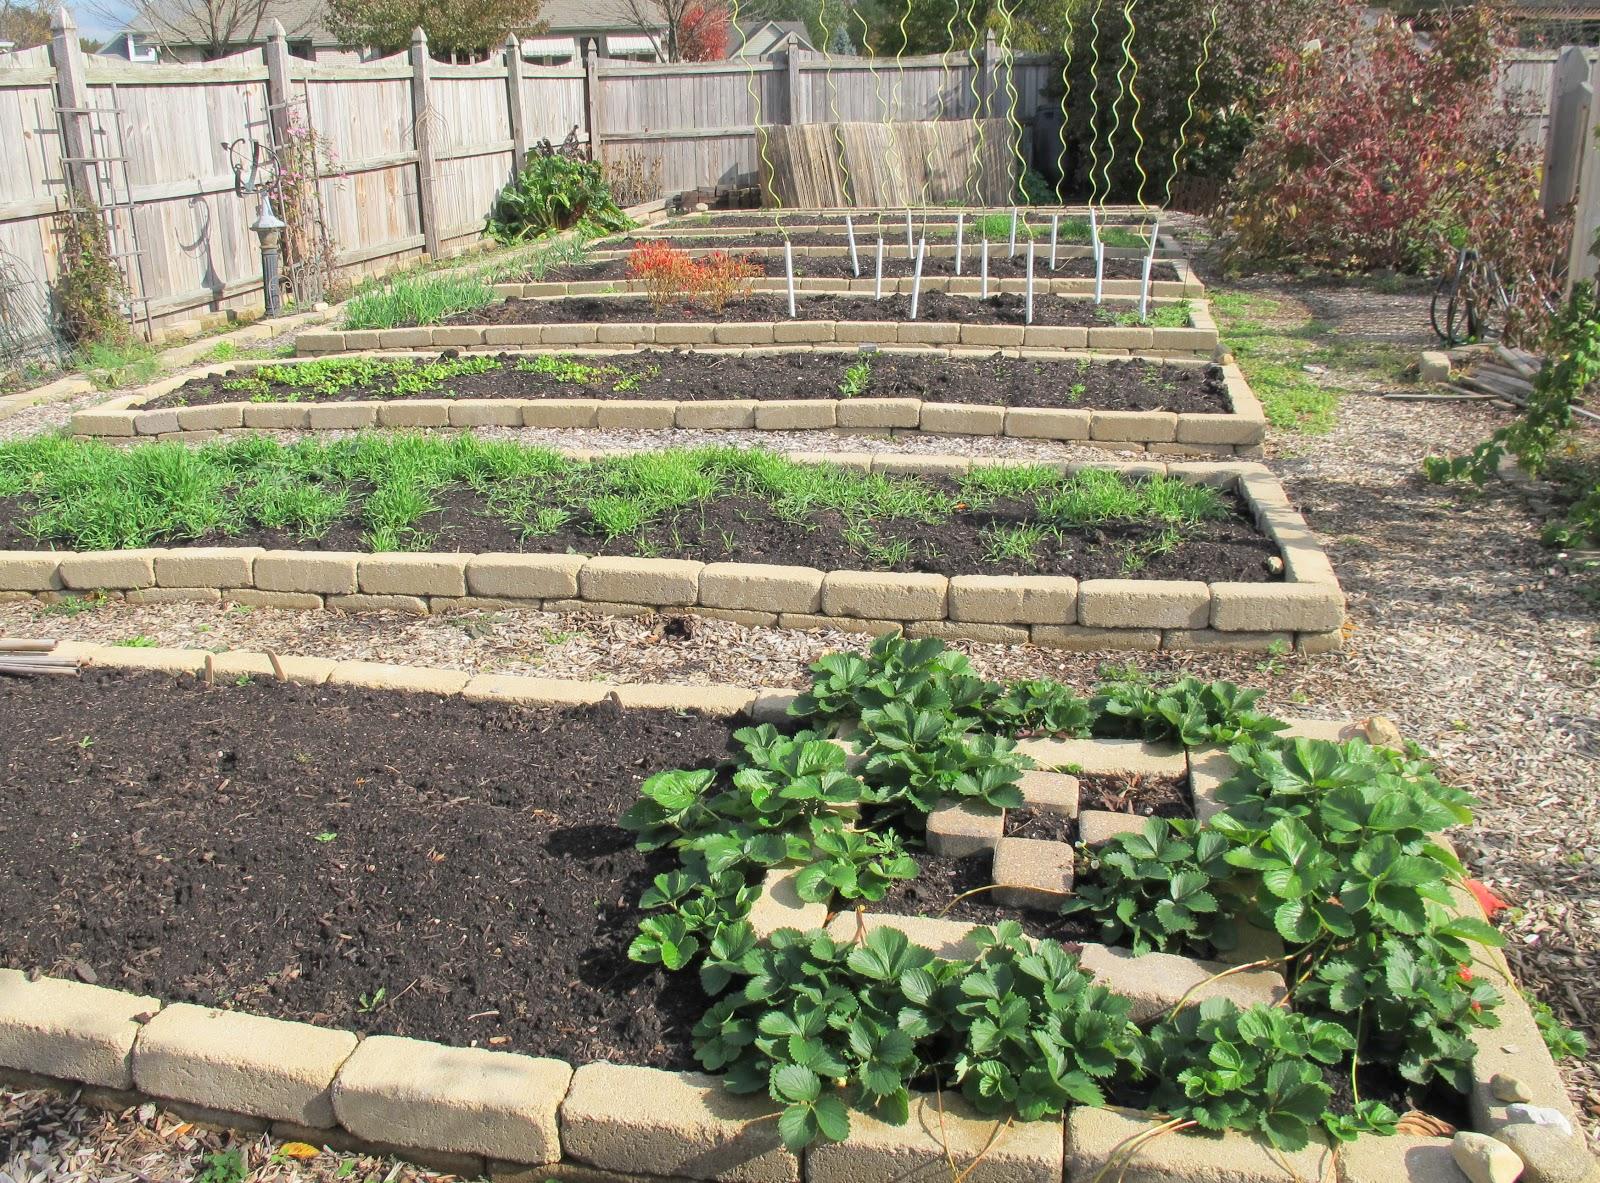 vegetable garden quotes. quotesgram